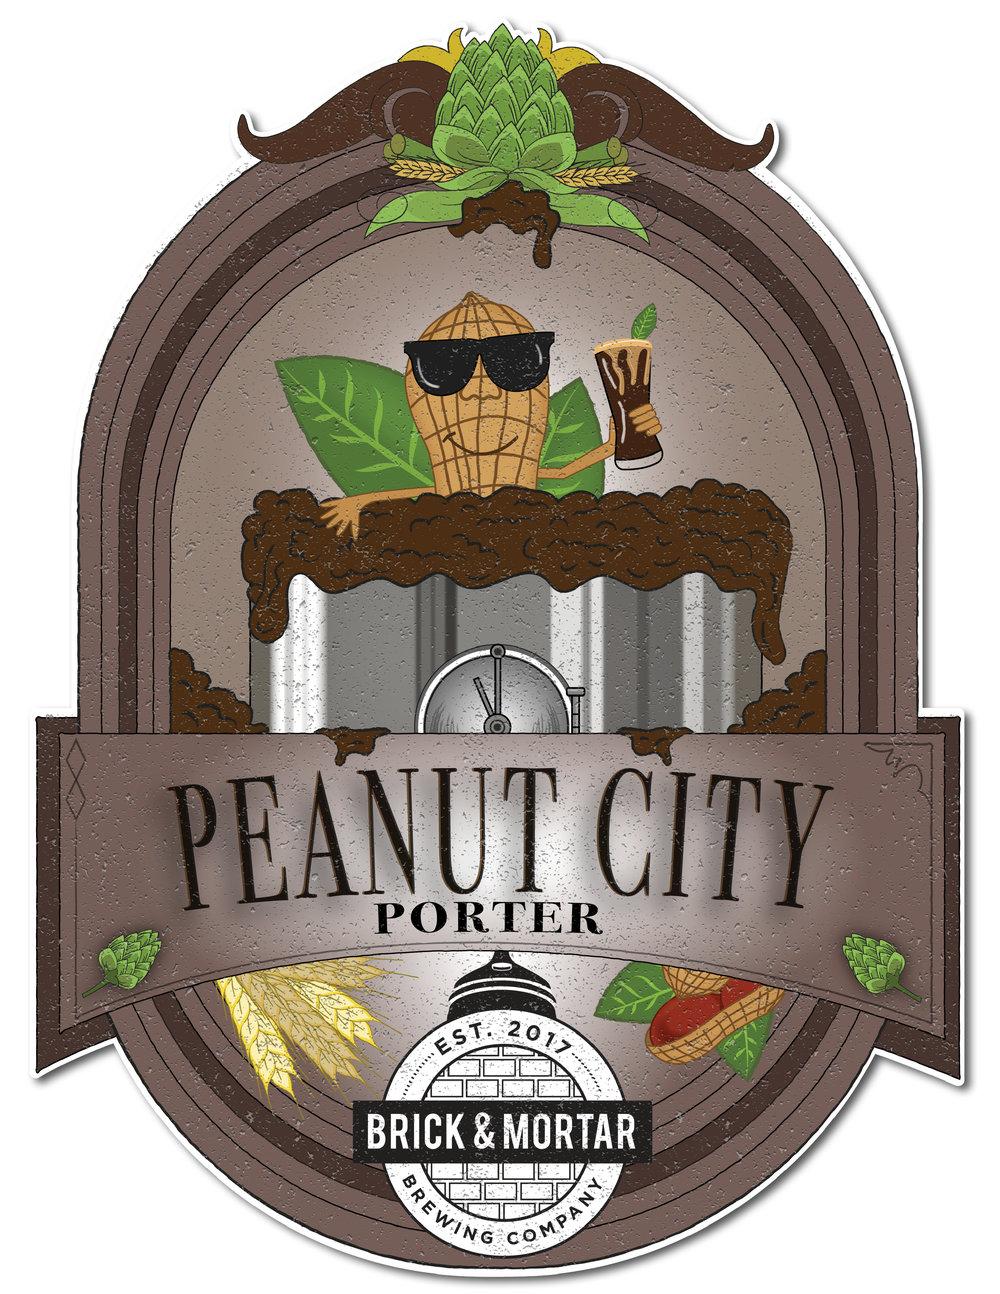 PeanutCityPorter.jpg